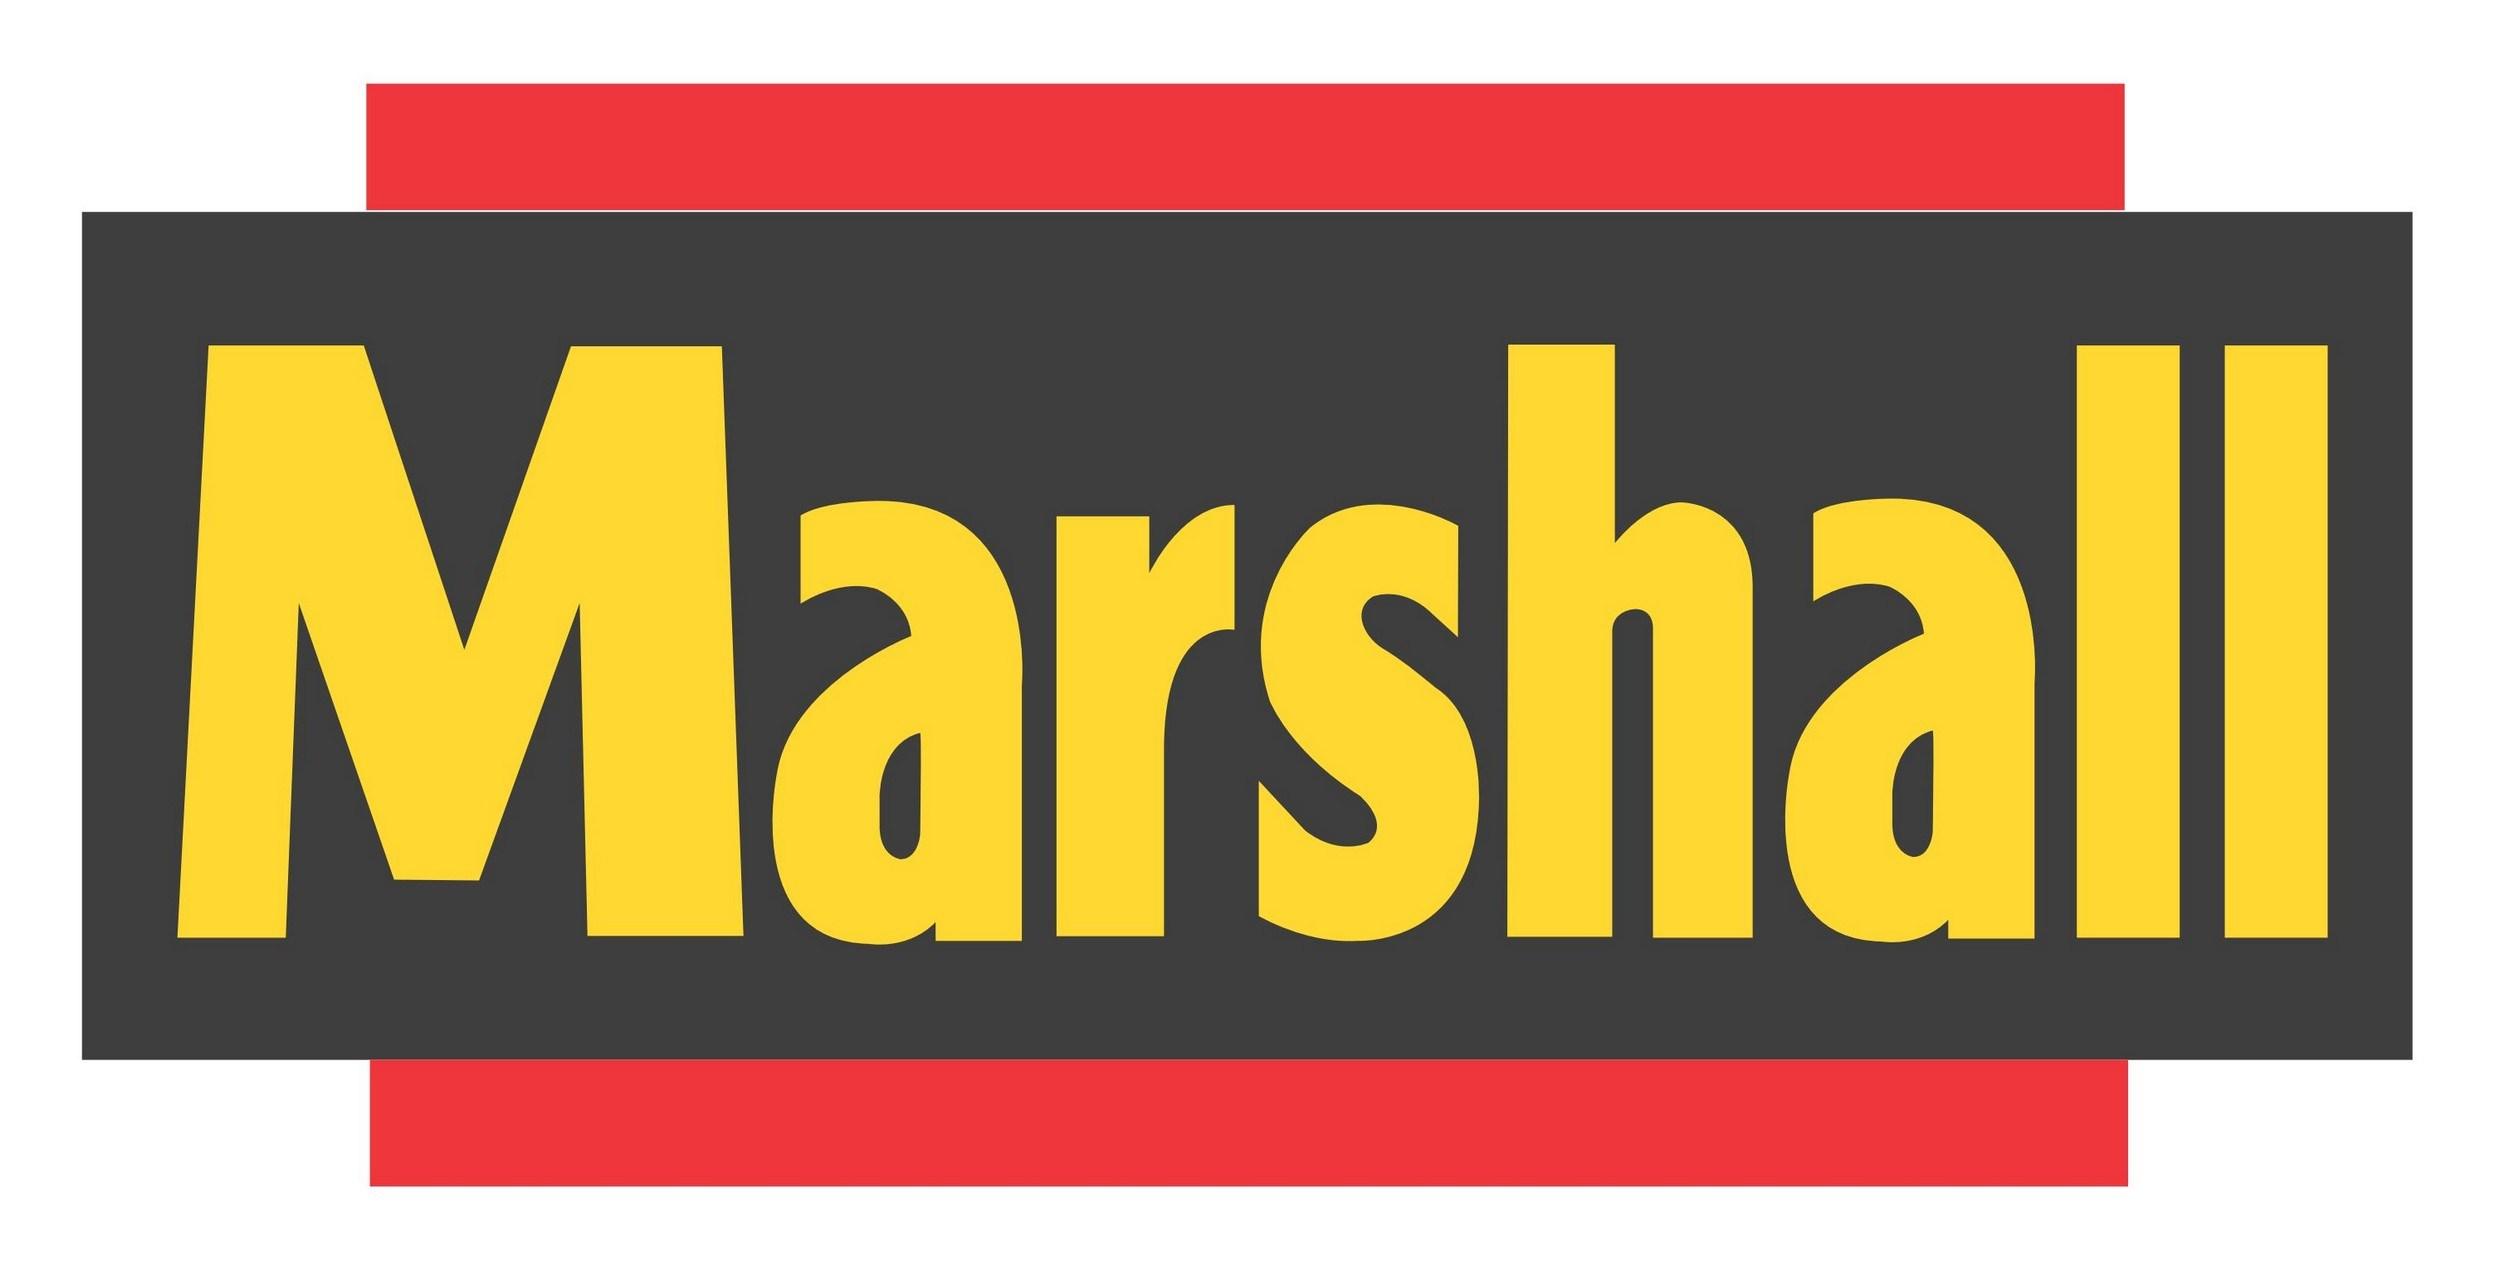 Marshall Boya Logo png